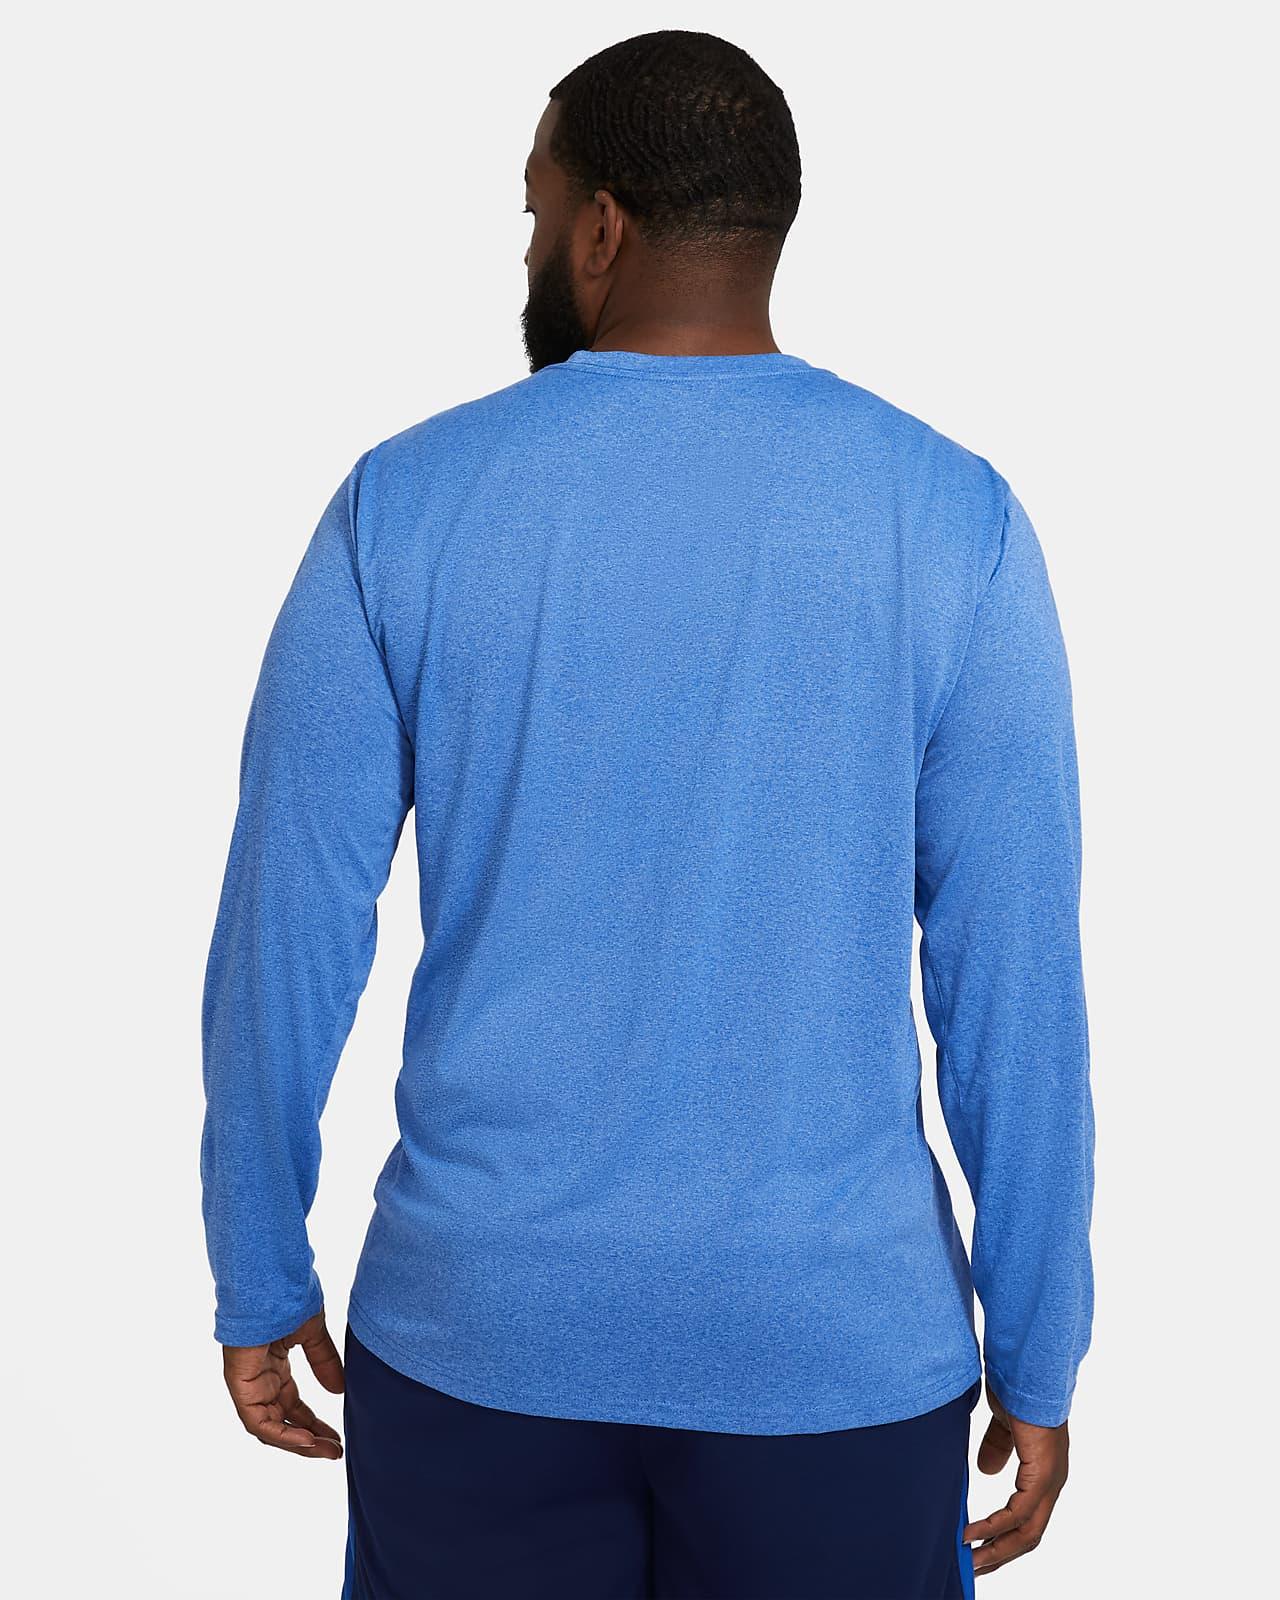 NIKE INFANT BOY/'S DRI-FIT TOP LONG SLEEVED TEE T-SHIRT BLUE 2 YRS  RRP £22